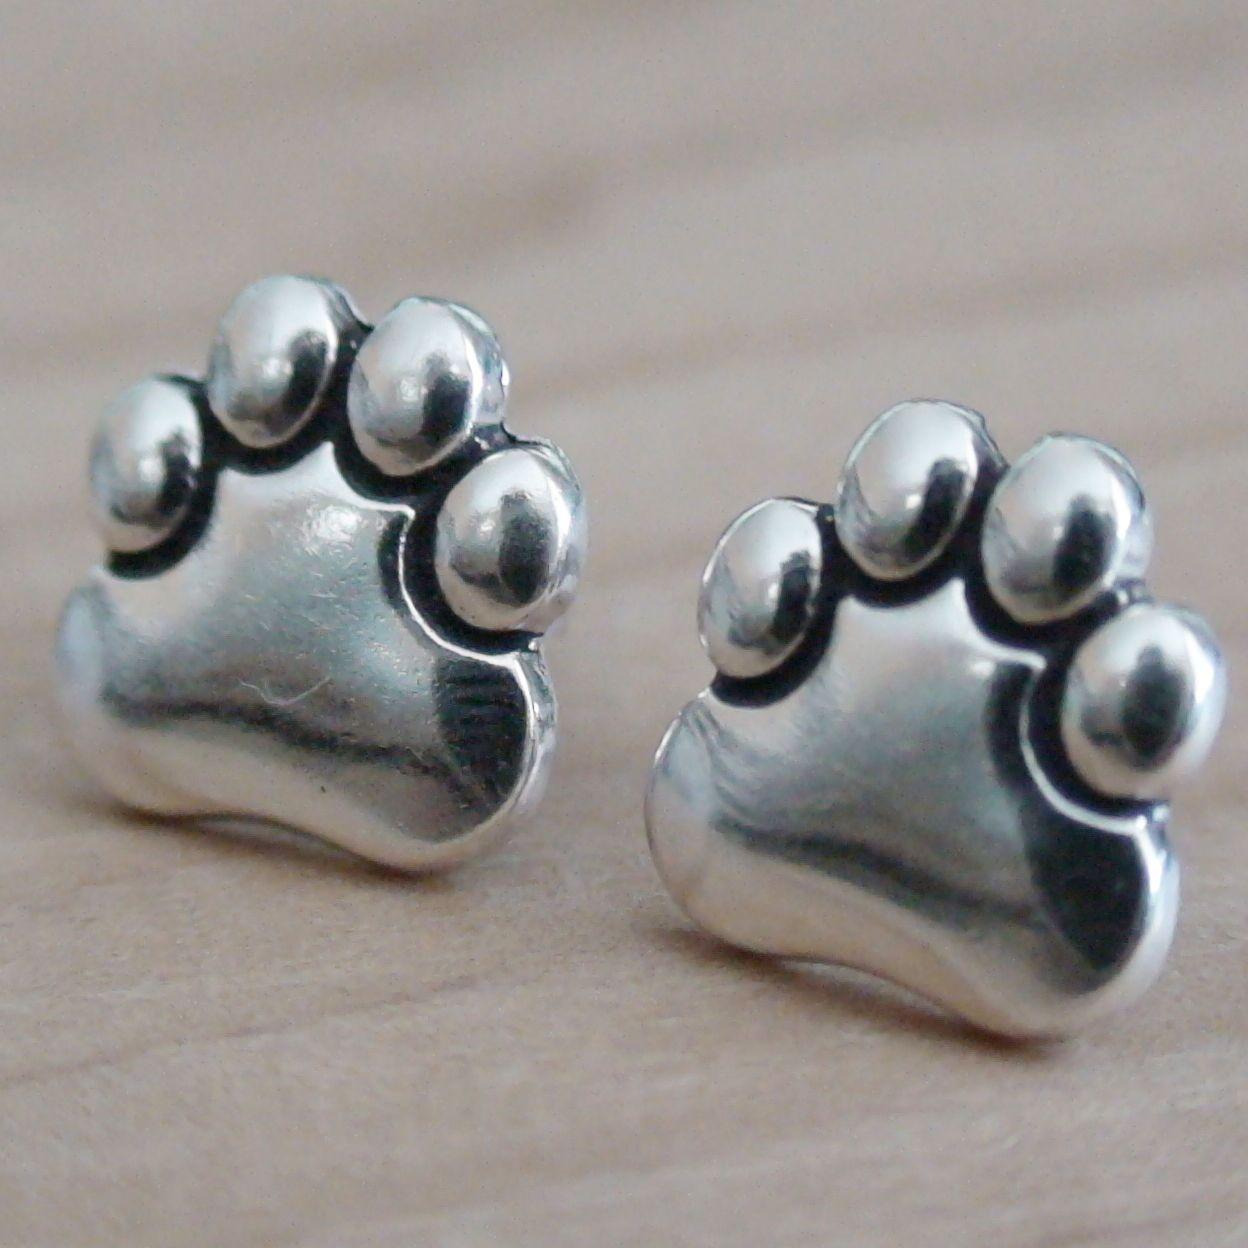 Paw Print Earrings - 925 Sterling Silver - Cat Dog Animal Pet Post Stud Bear